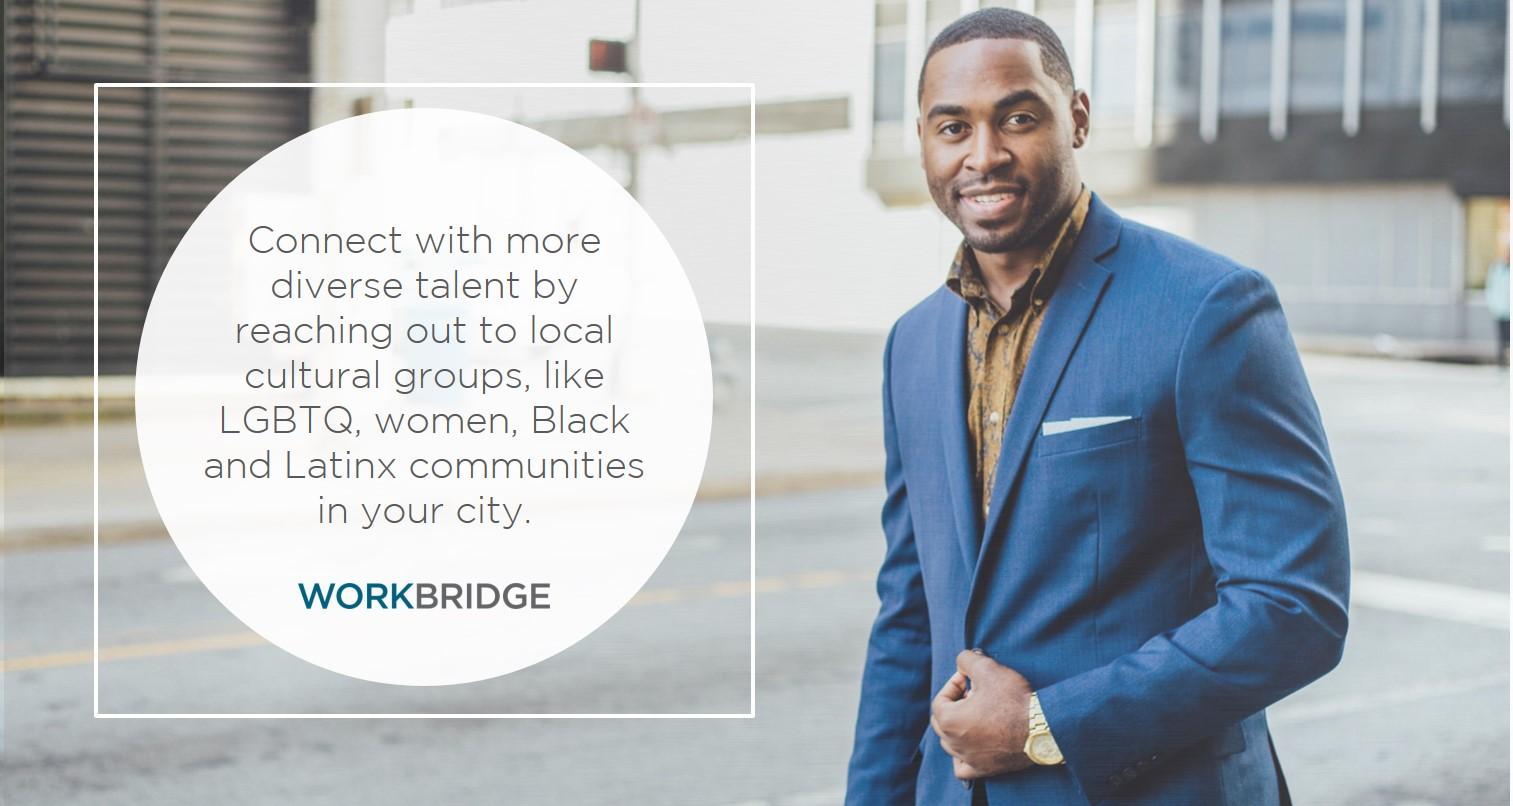 recruiting-tips, diverse-talent, best-hiring-practices, workbridge-associates, technology